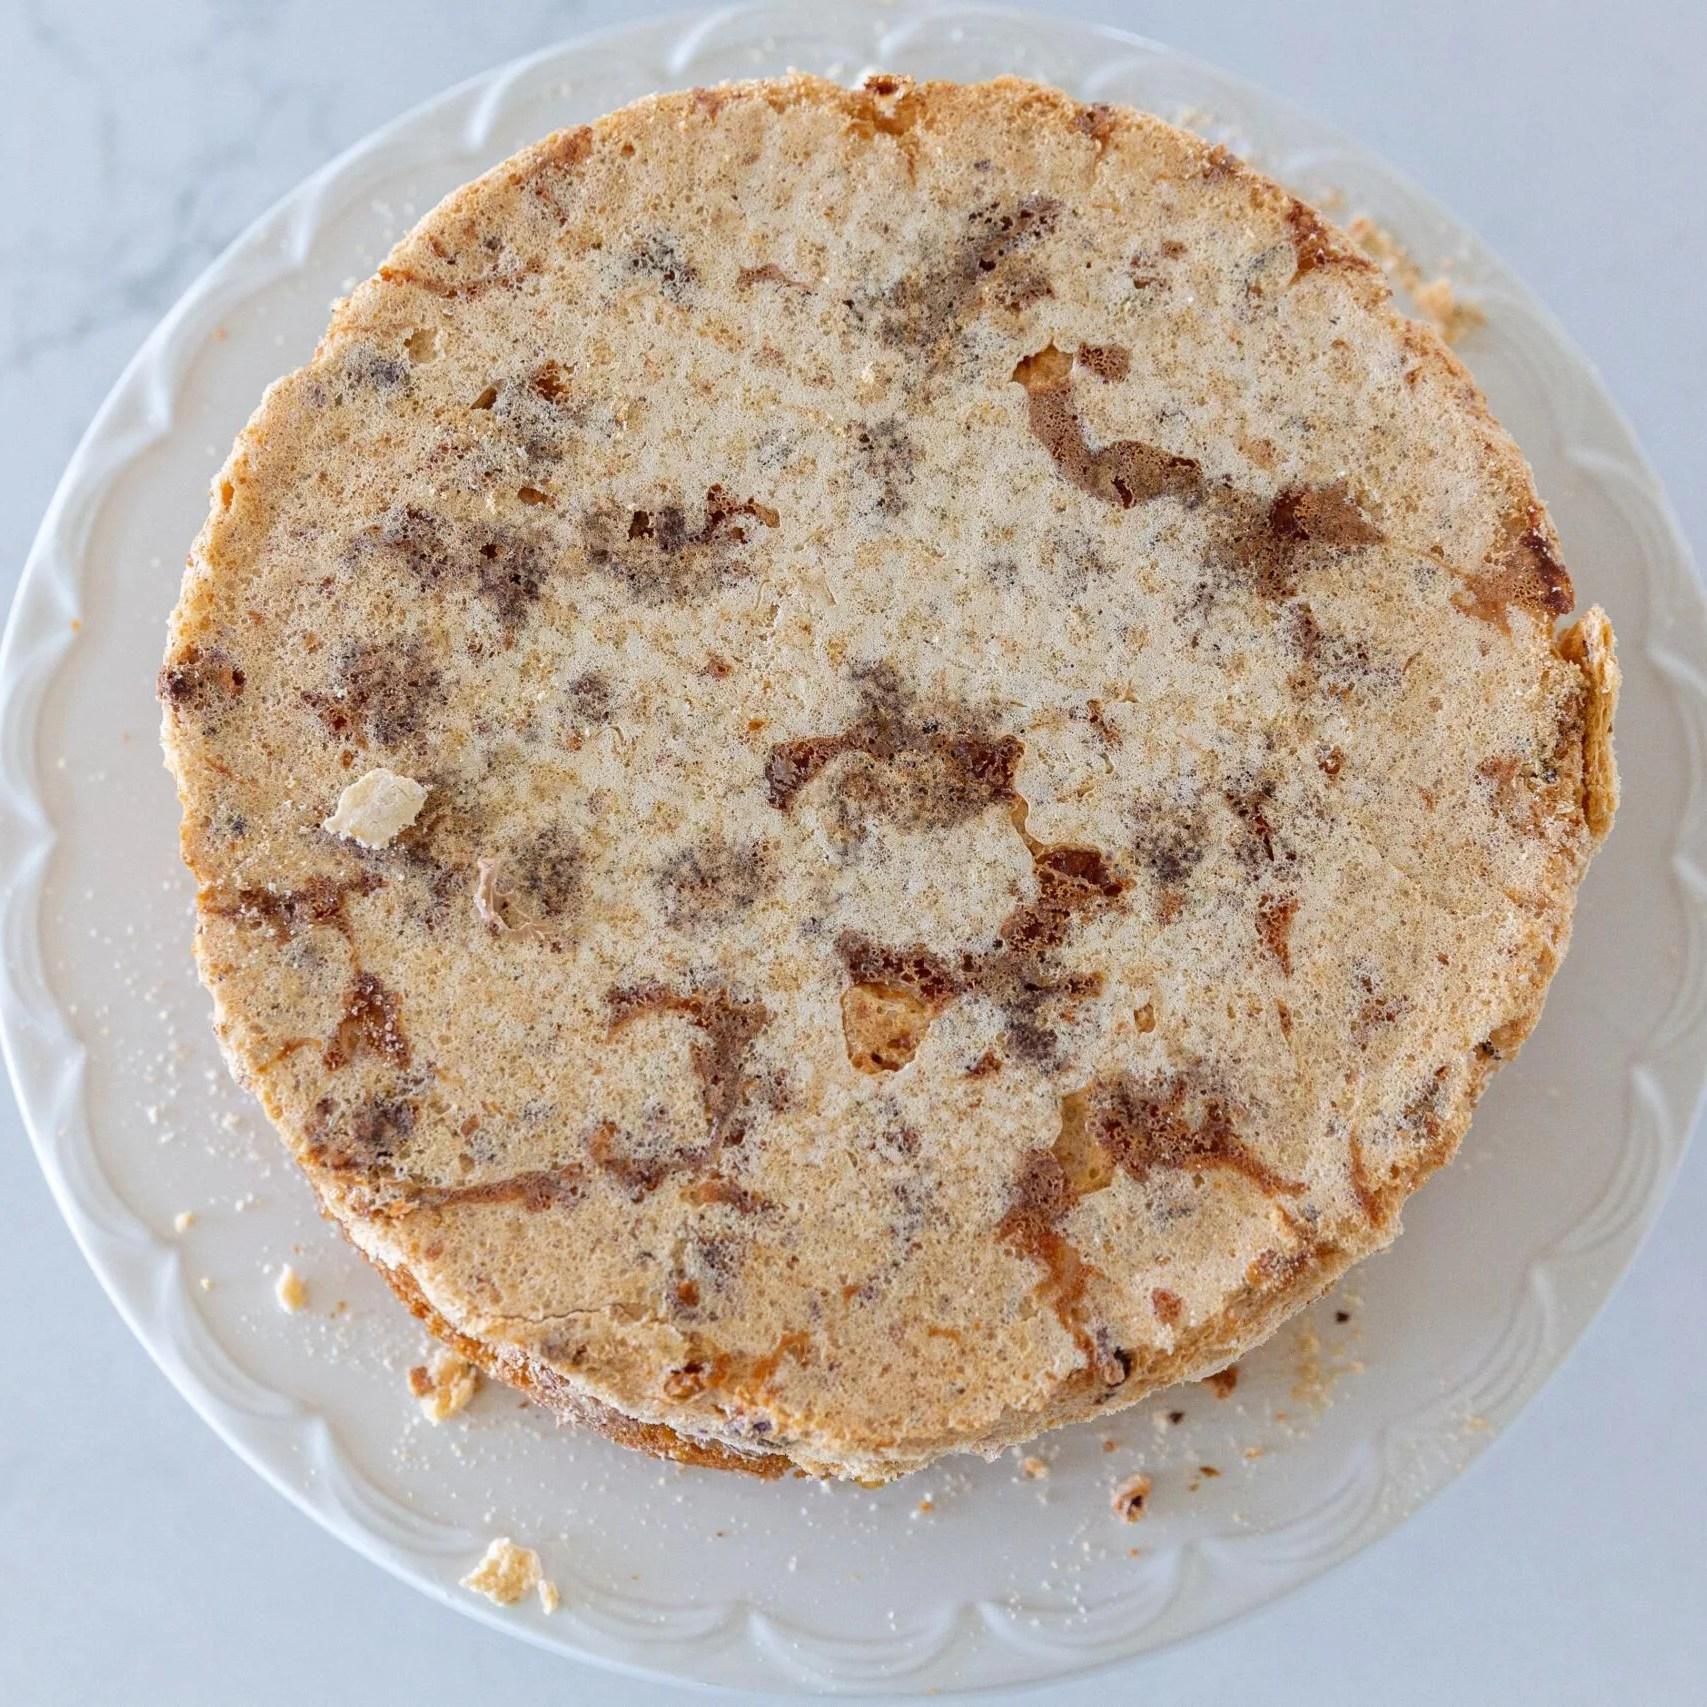 Meringue added to the sponge cake